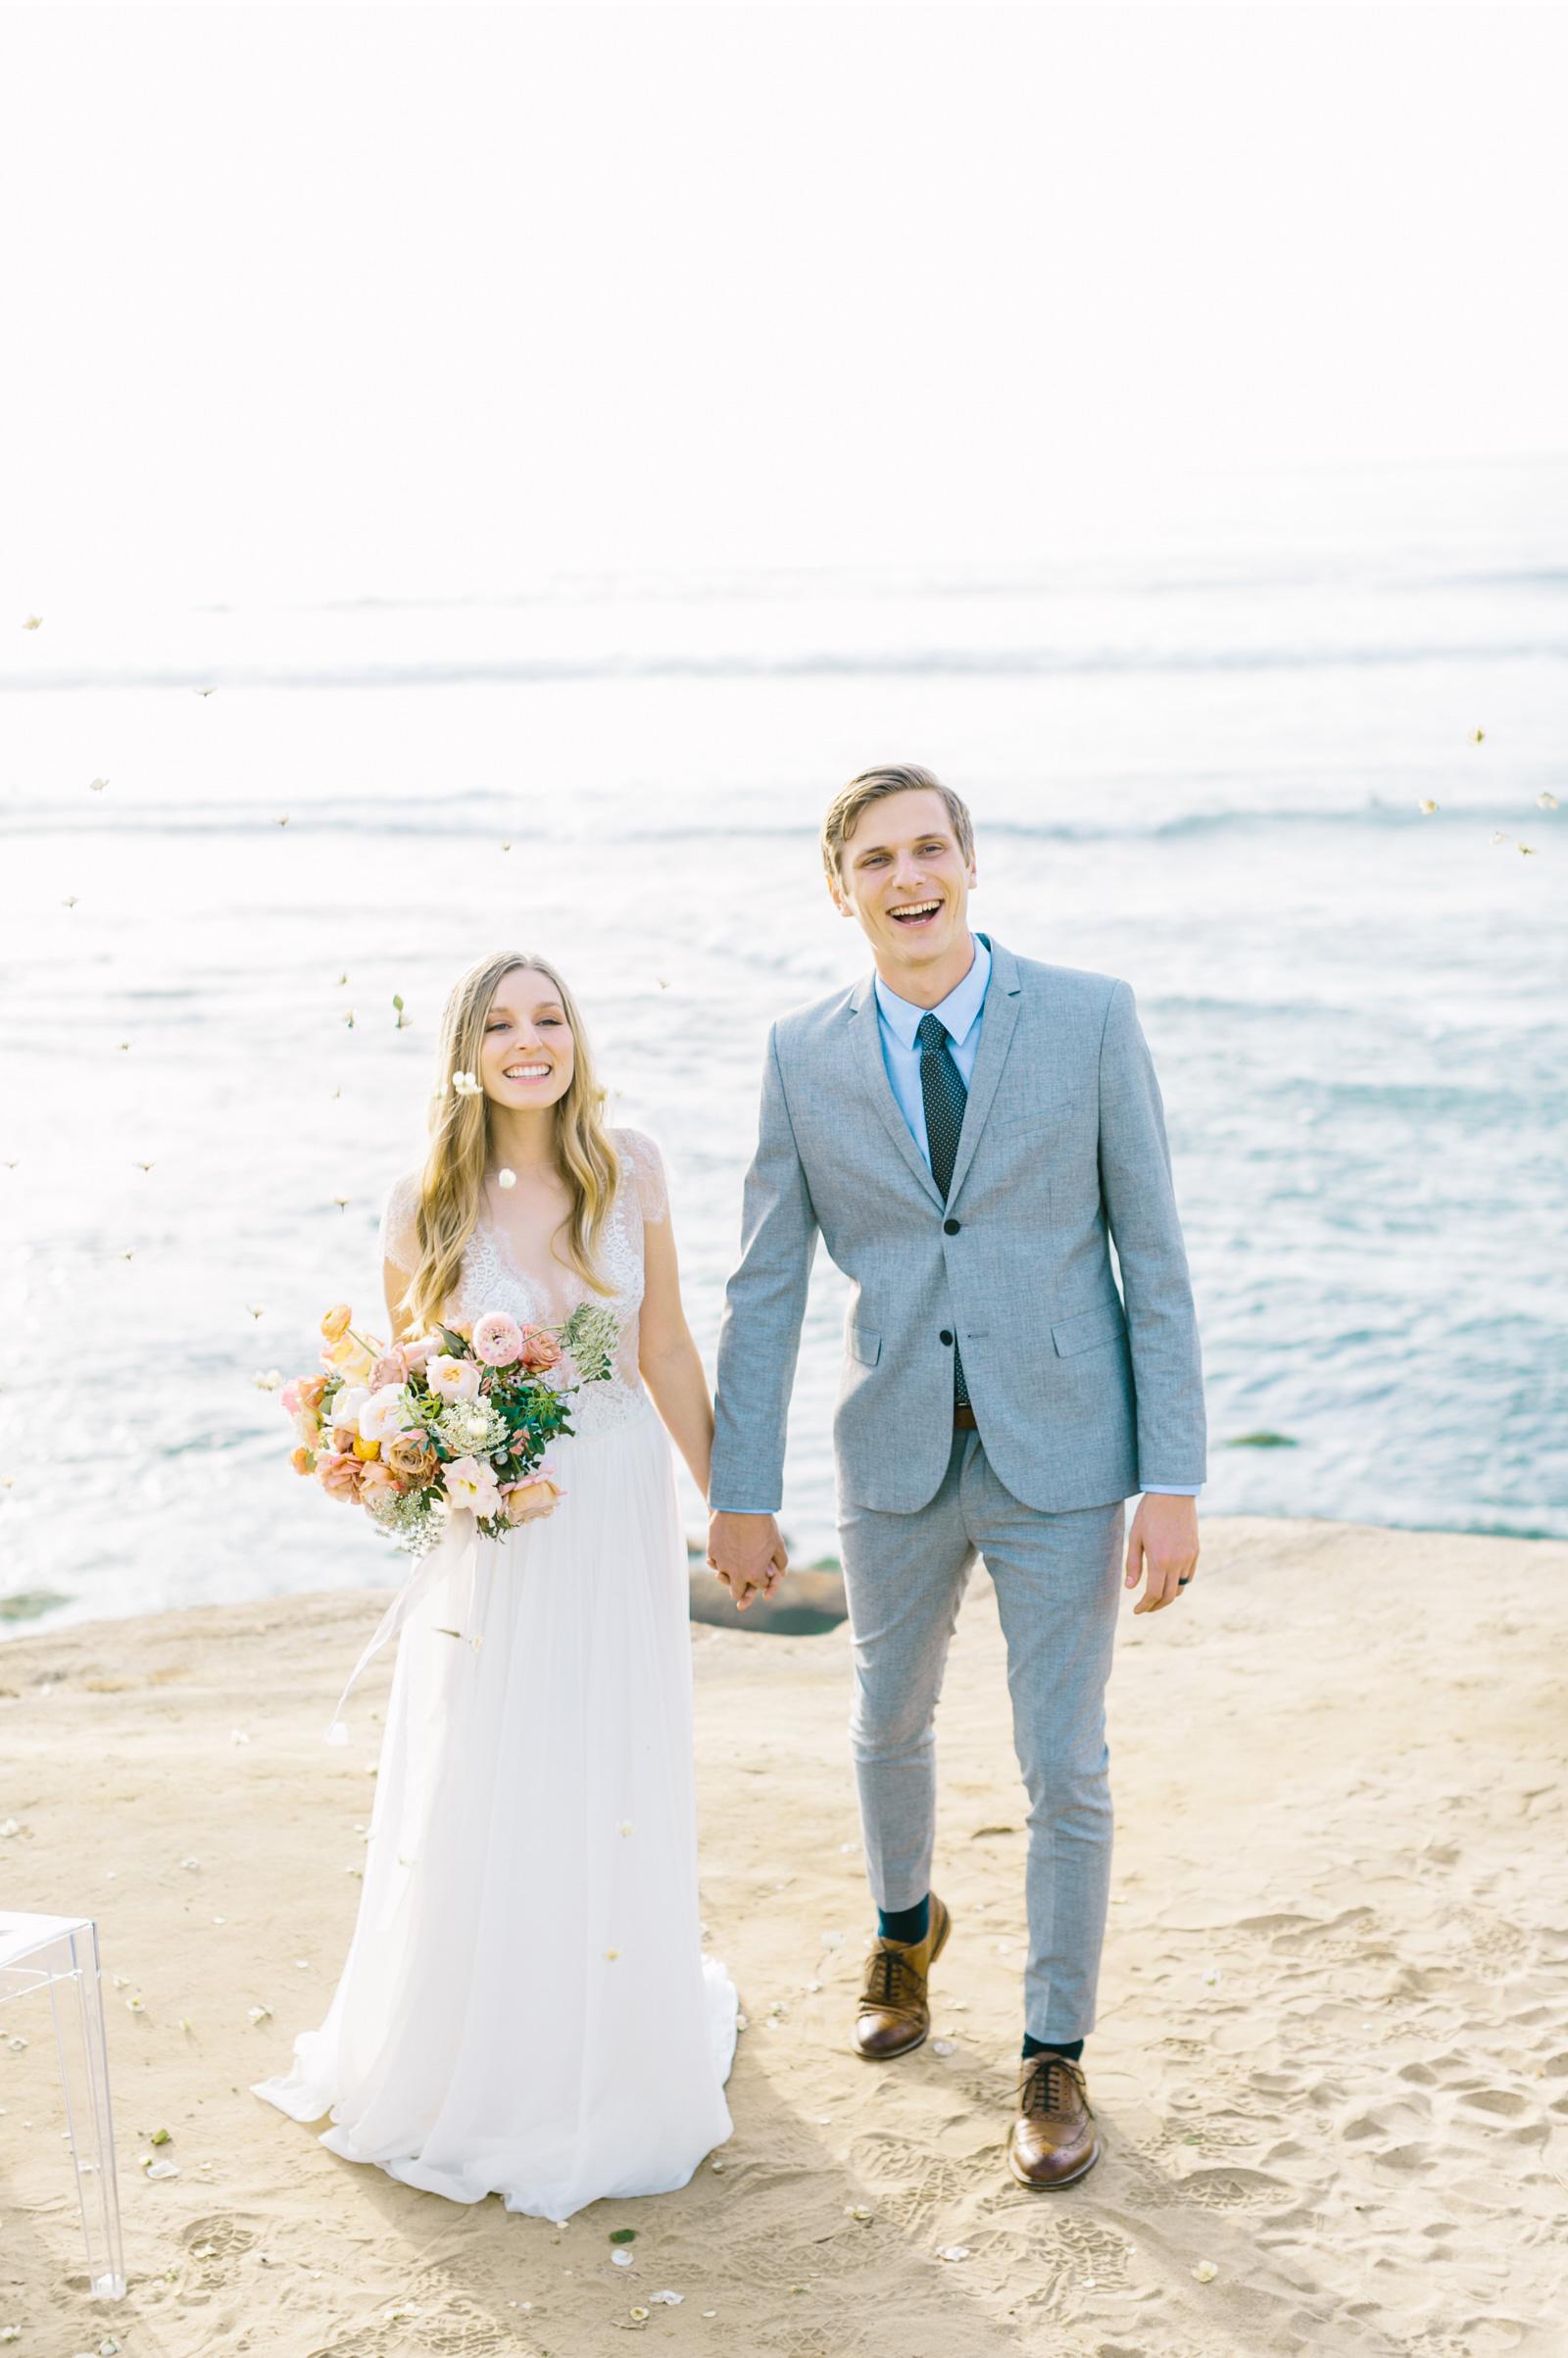 Style-Me-Pretty-California-Beach-Wedding-Natalie-Schutt-Photography_01.jpg